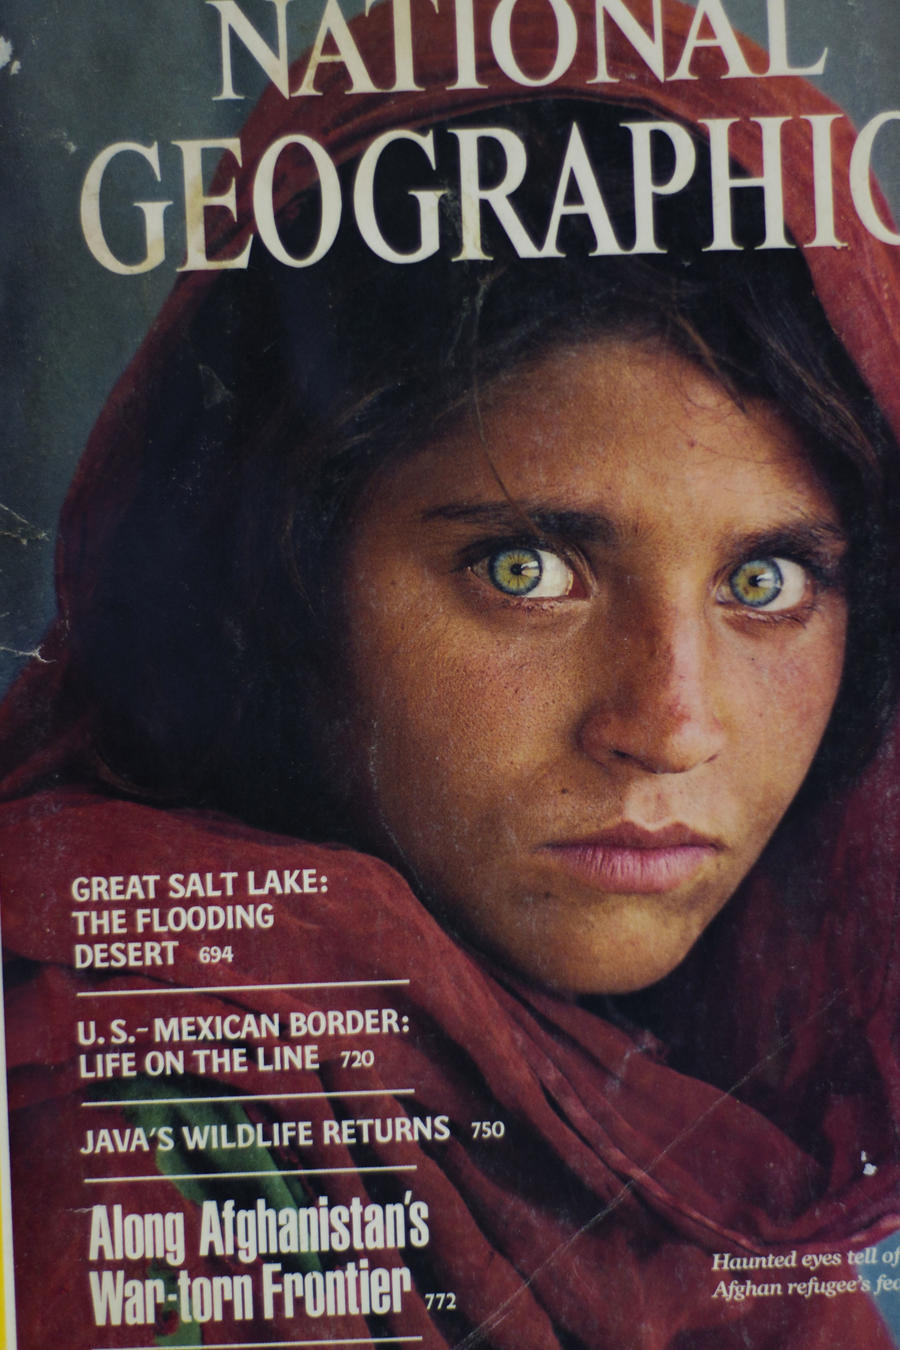 Niña afgana en National Geographic